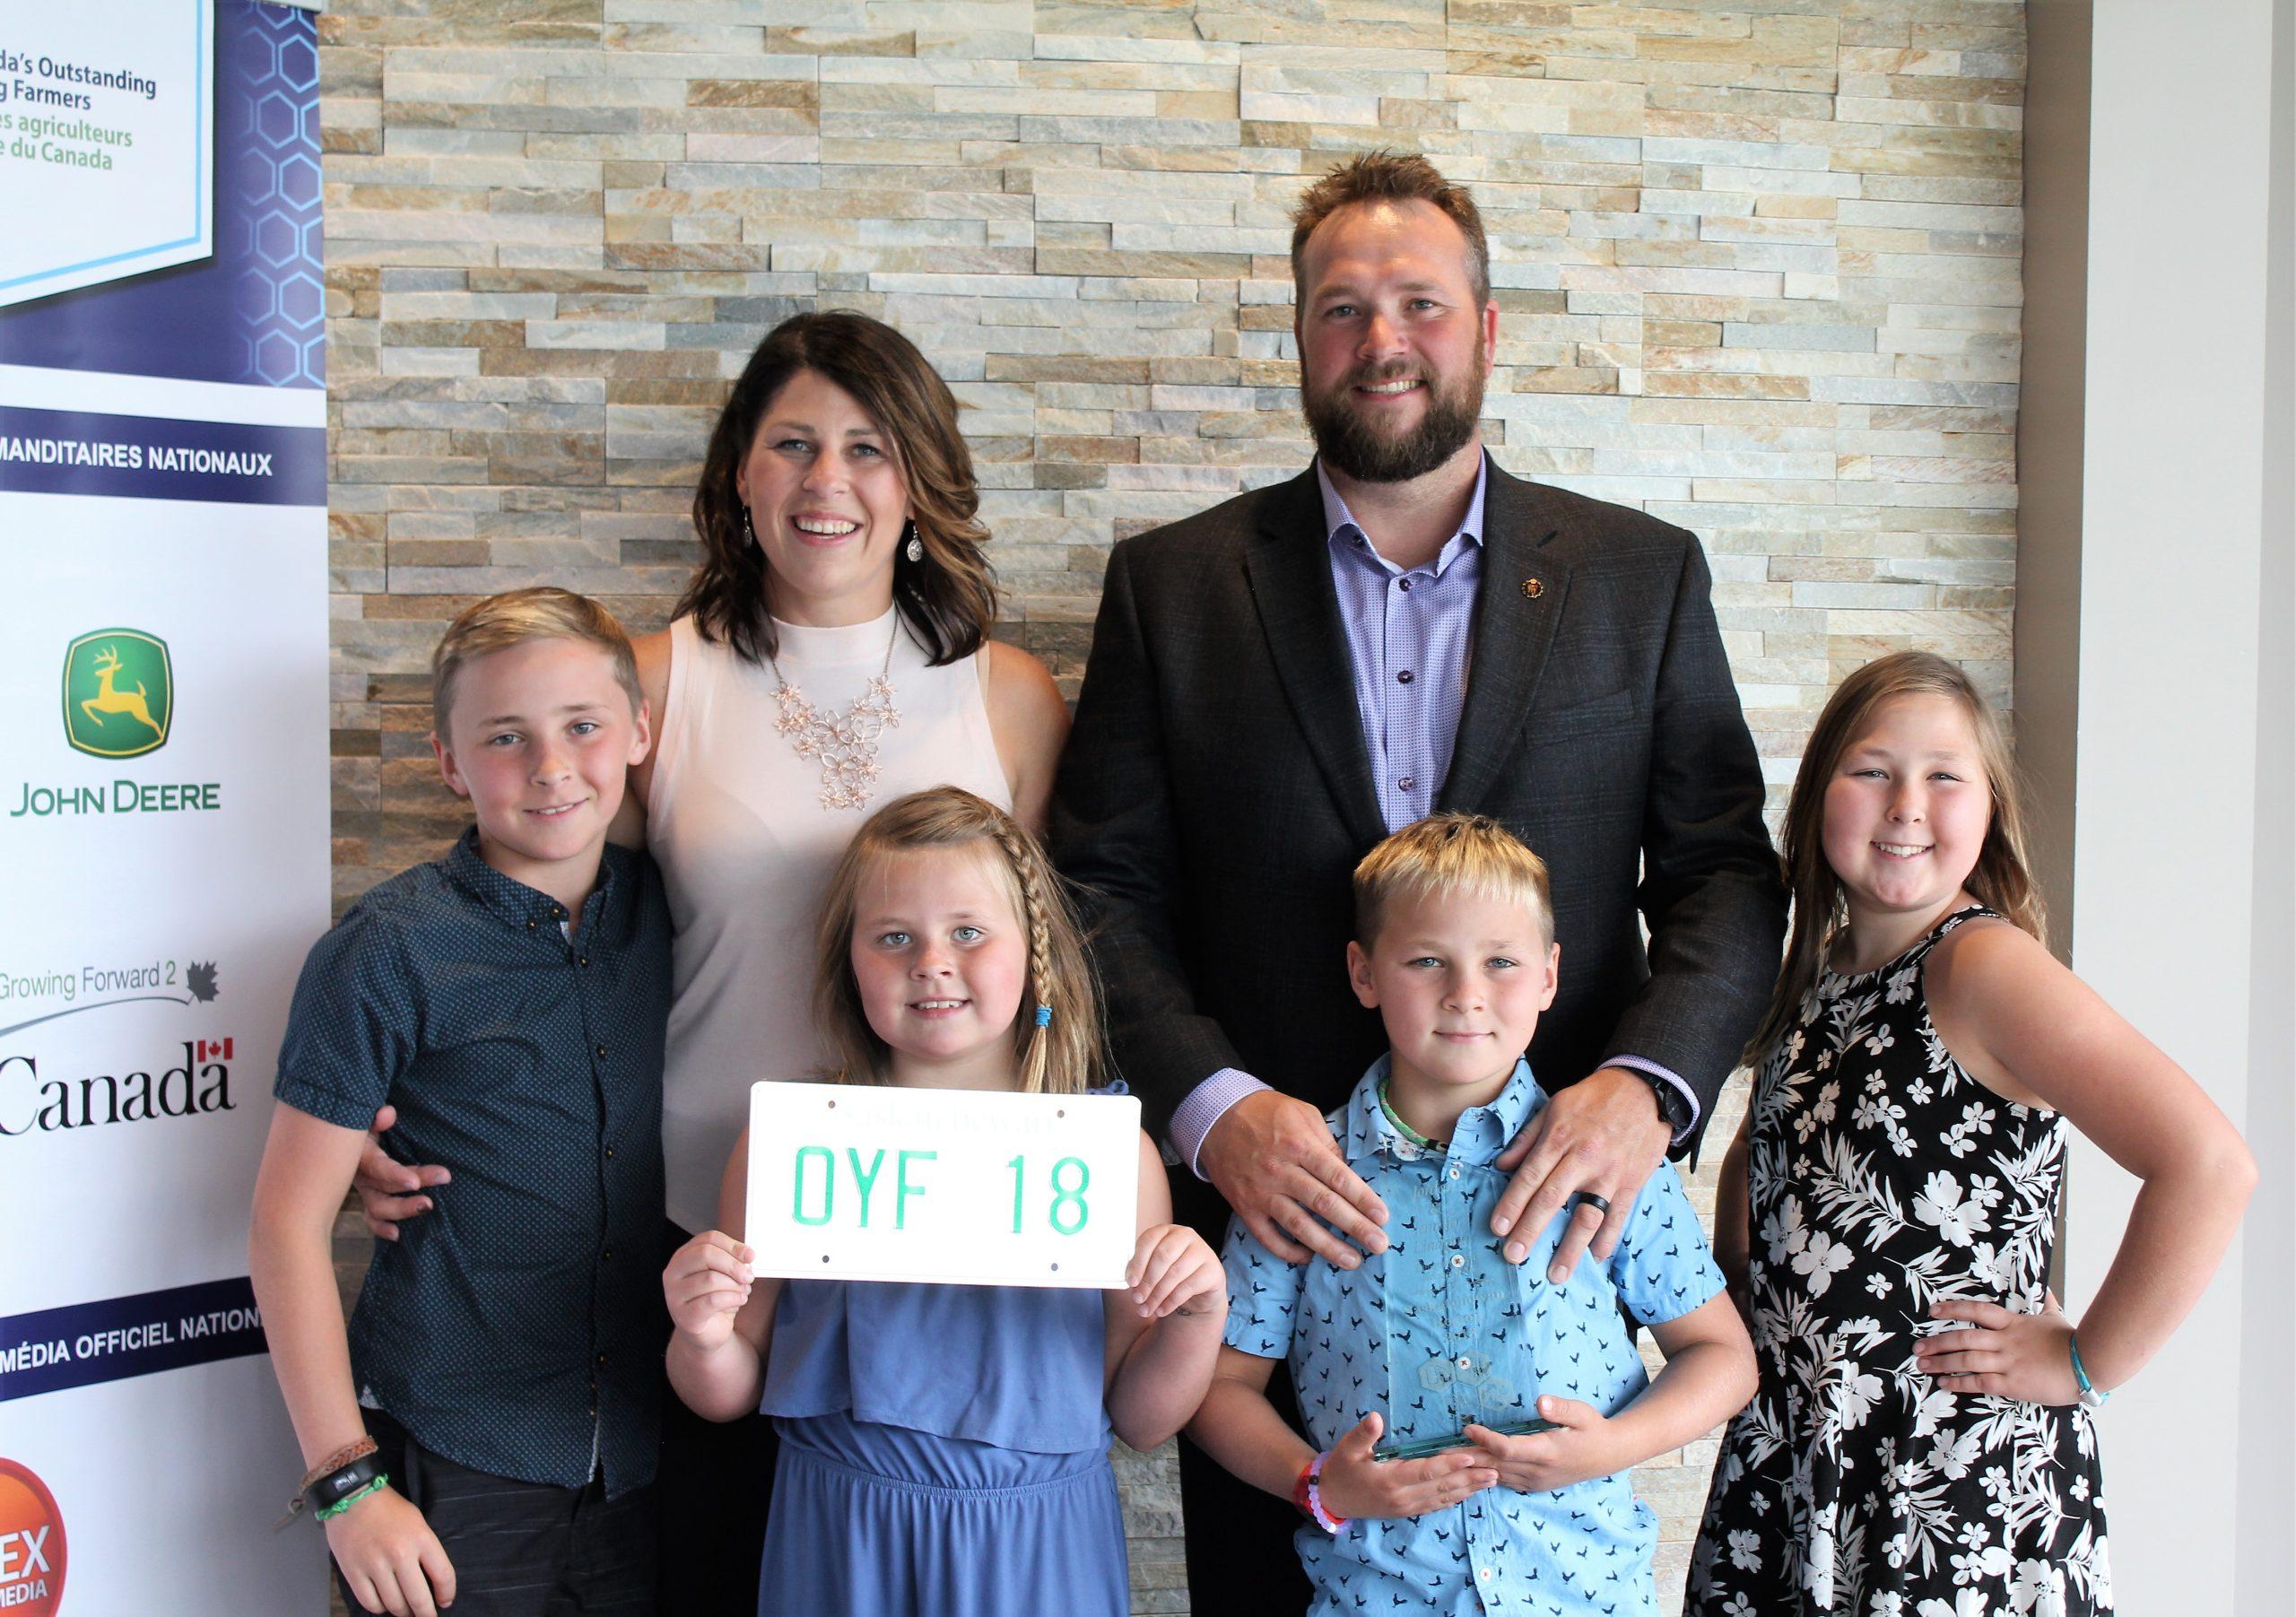 Norquay Couple Receive Saskatchewan Outstanding Young Farmers Award